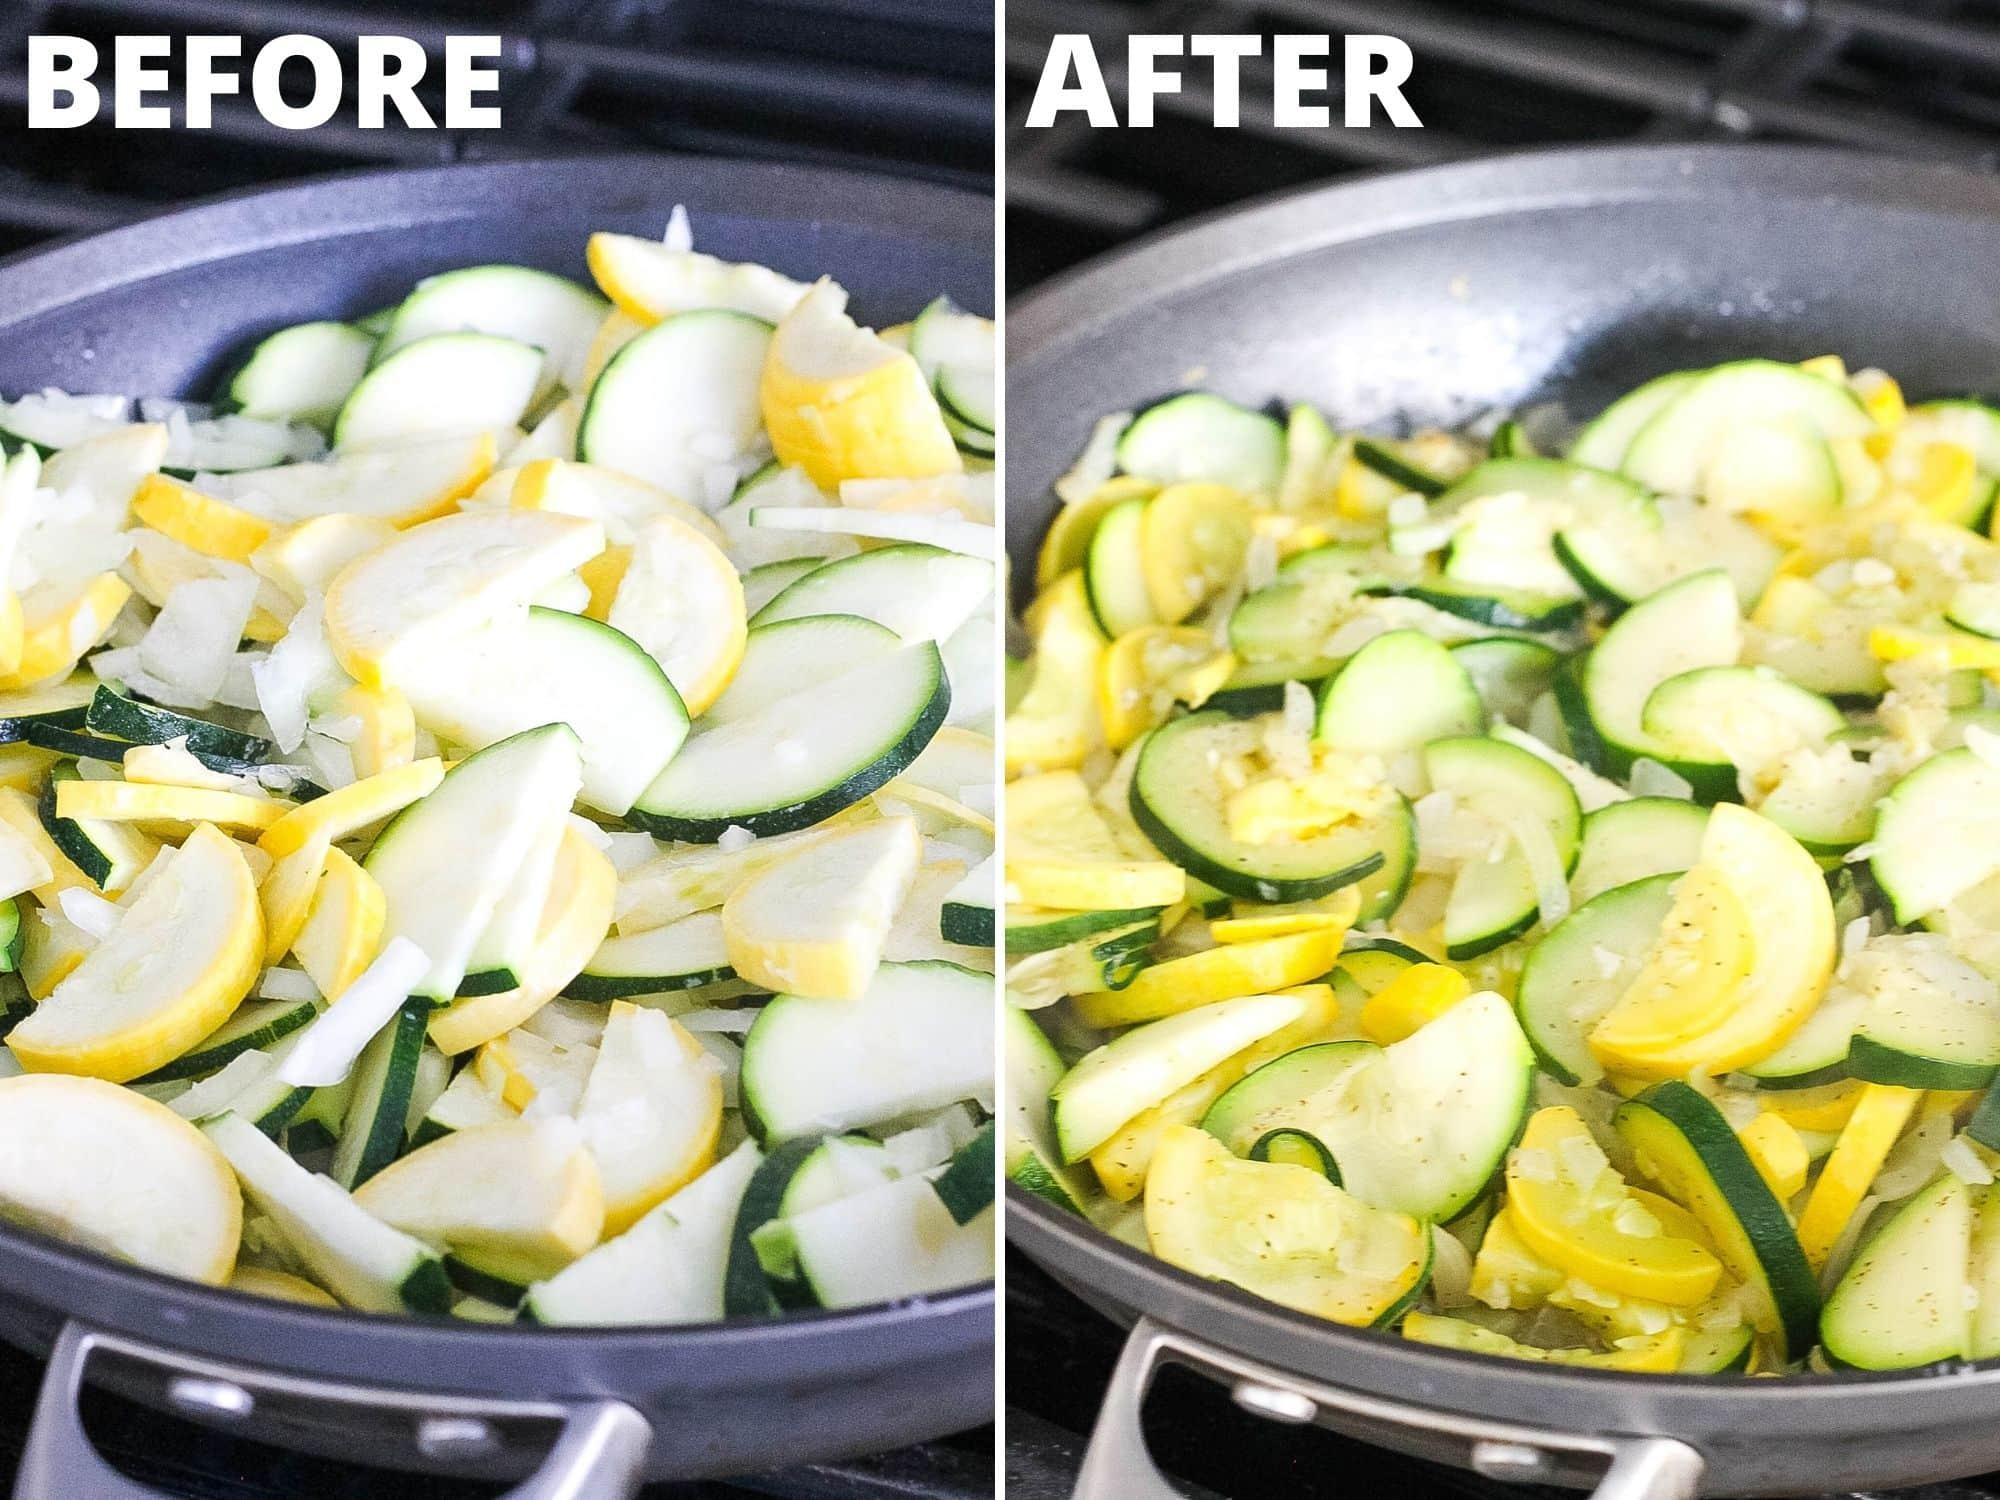 sautéing squash and zucchini